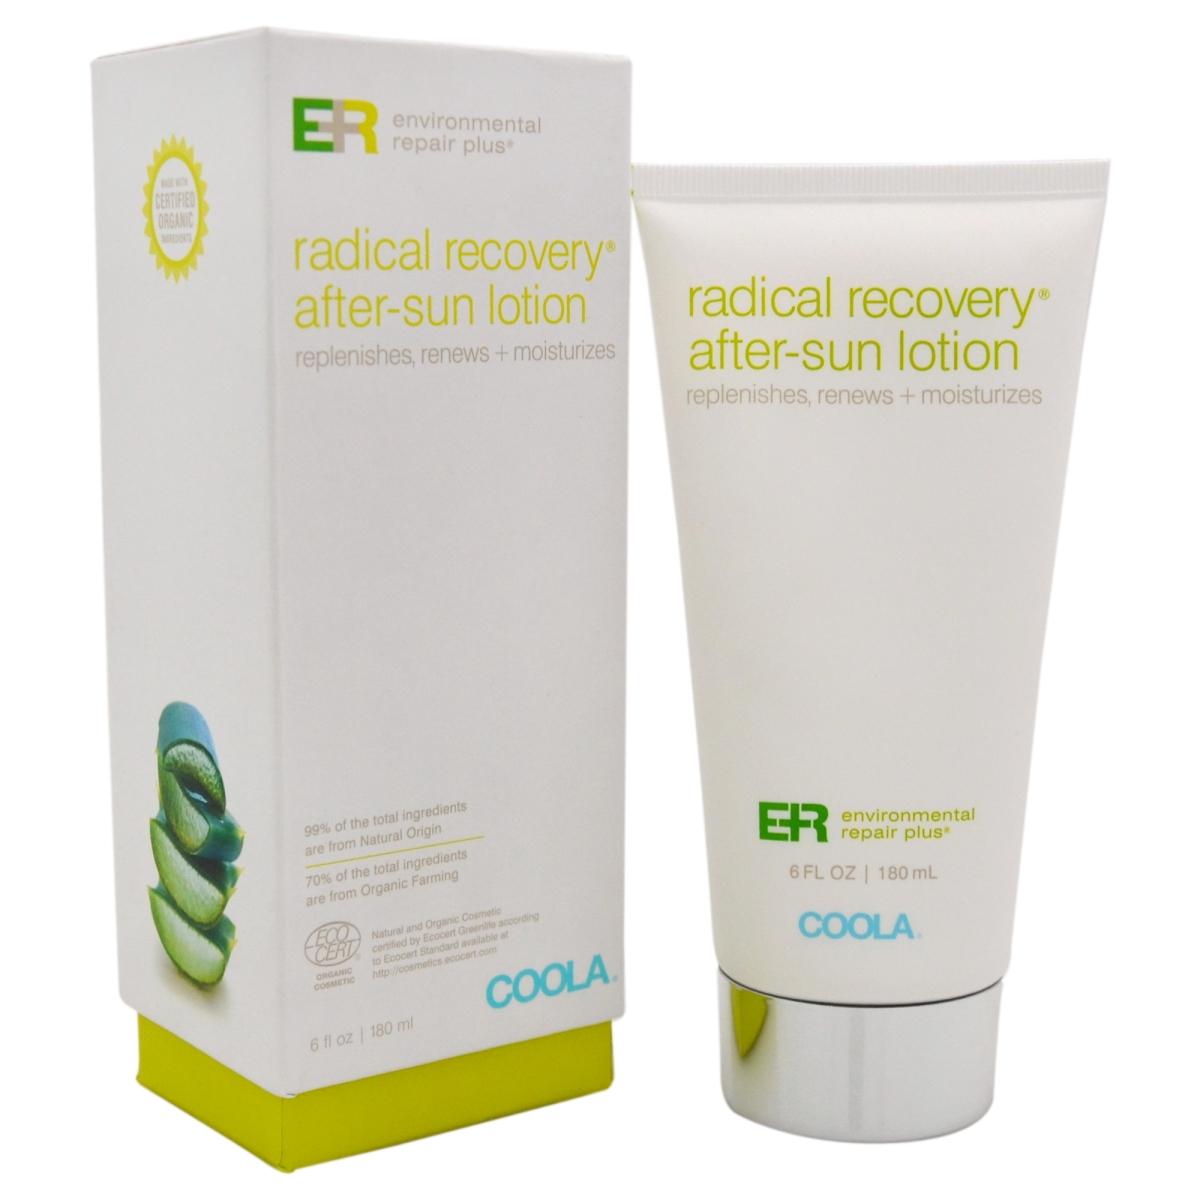 U-SC-4046 ER Radial Recovery 6 oz Sunscreen Moisturizer Lotion for Unisex